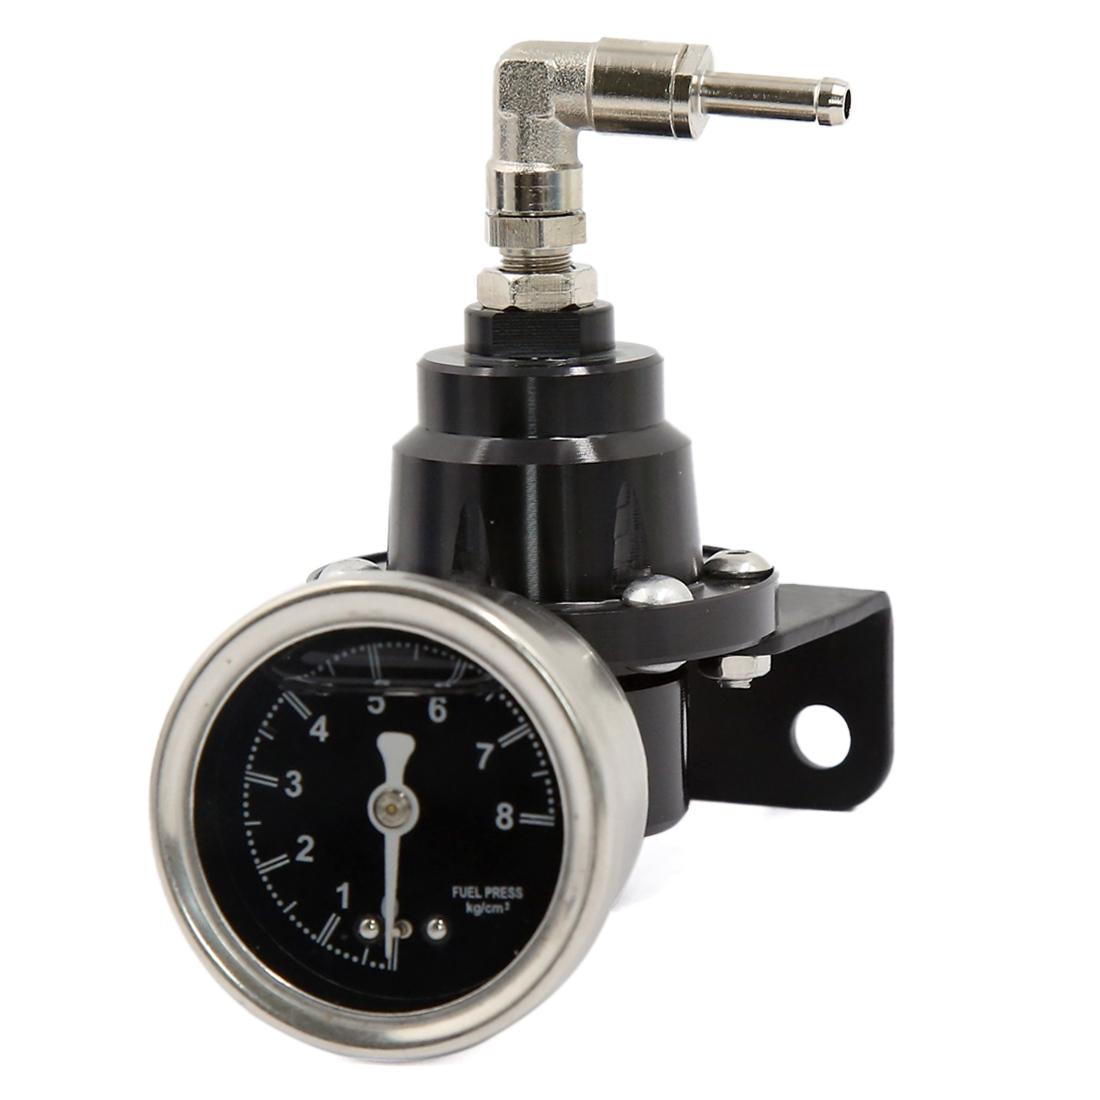 Aluminum Alloy Adjustable Fuel Pressure Regulator Oil Gauge Kit Black